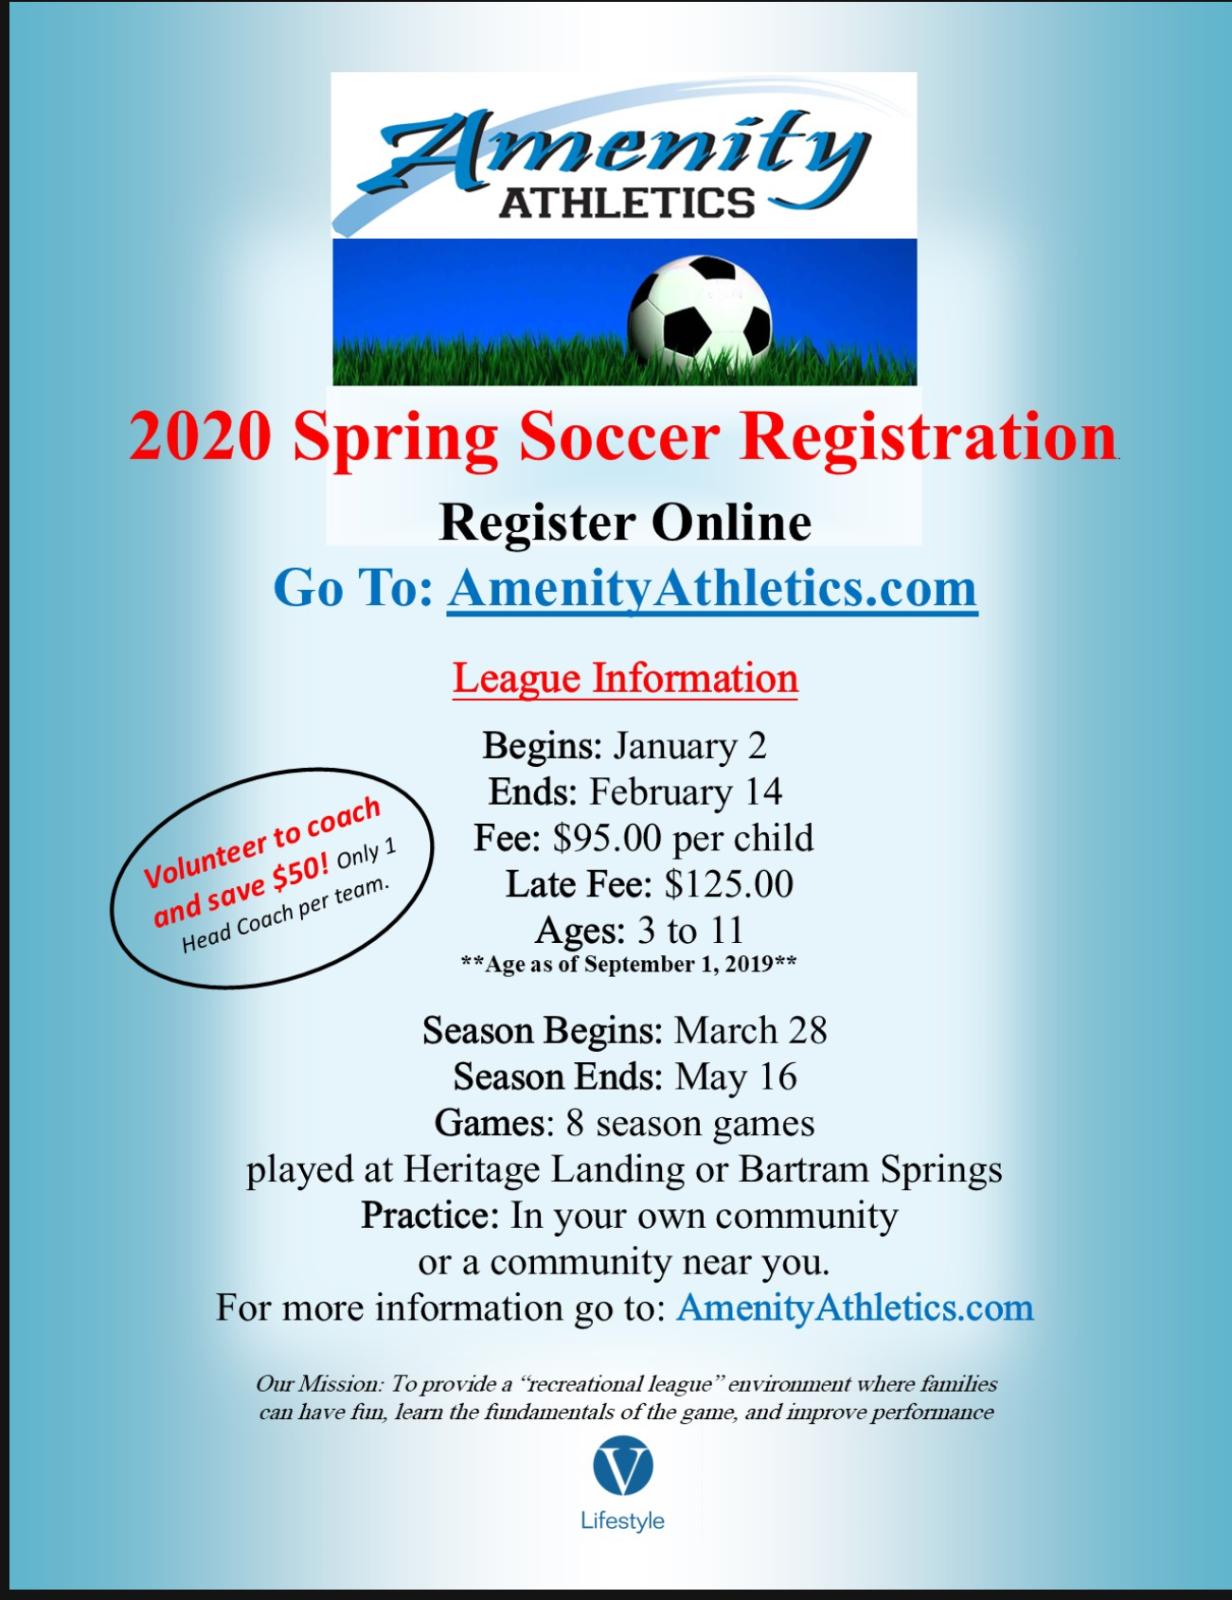 2020 Spring Soccer